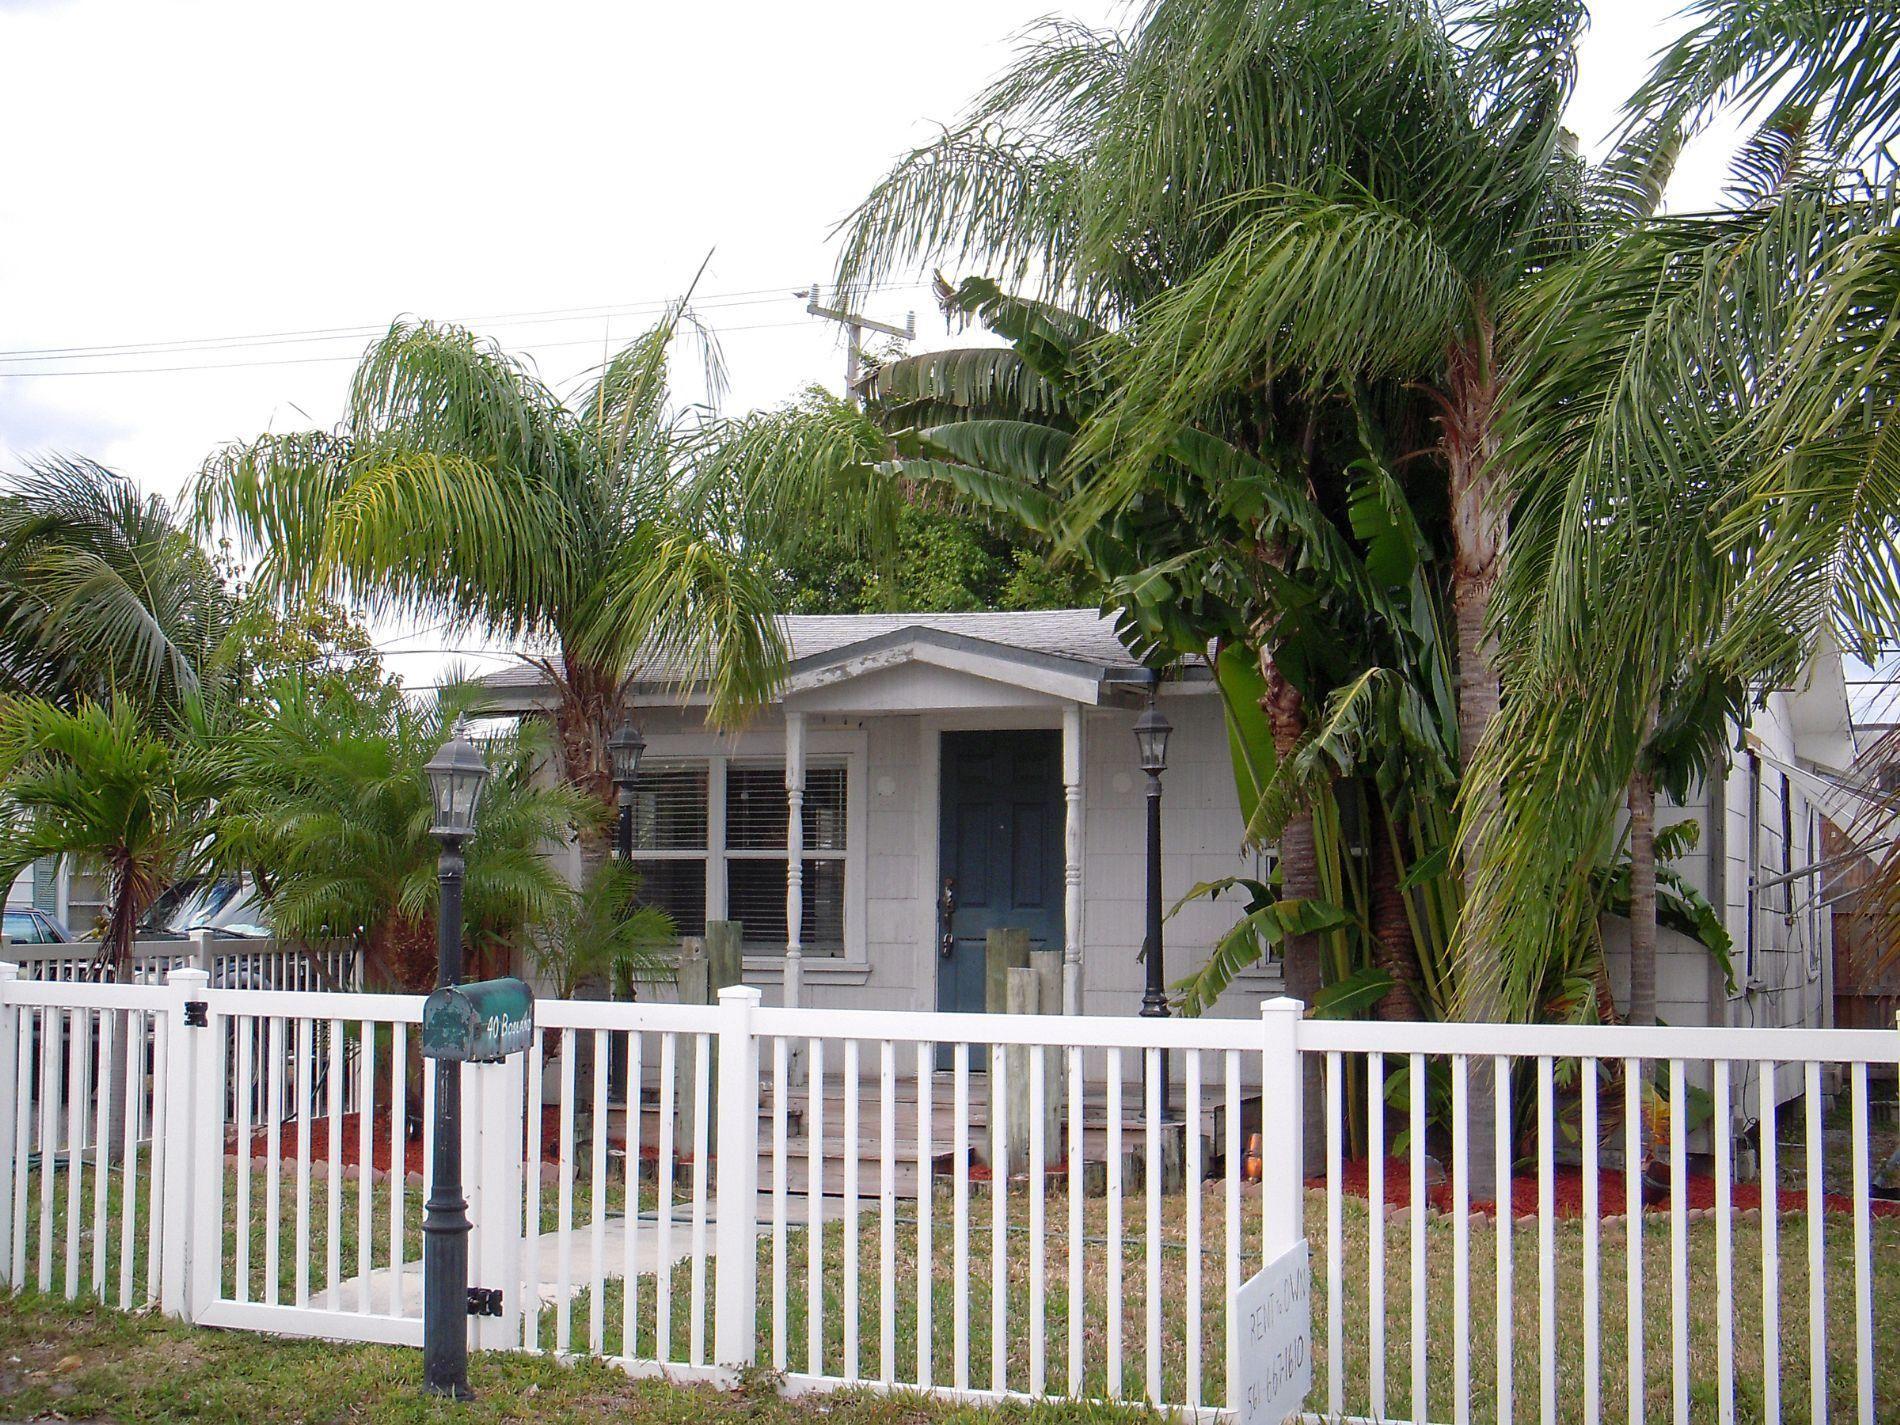 Photo of 40 E 25th Street, Riviera Beach, FL 33404 (MLS # RX-10648370)